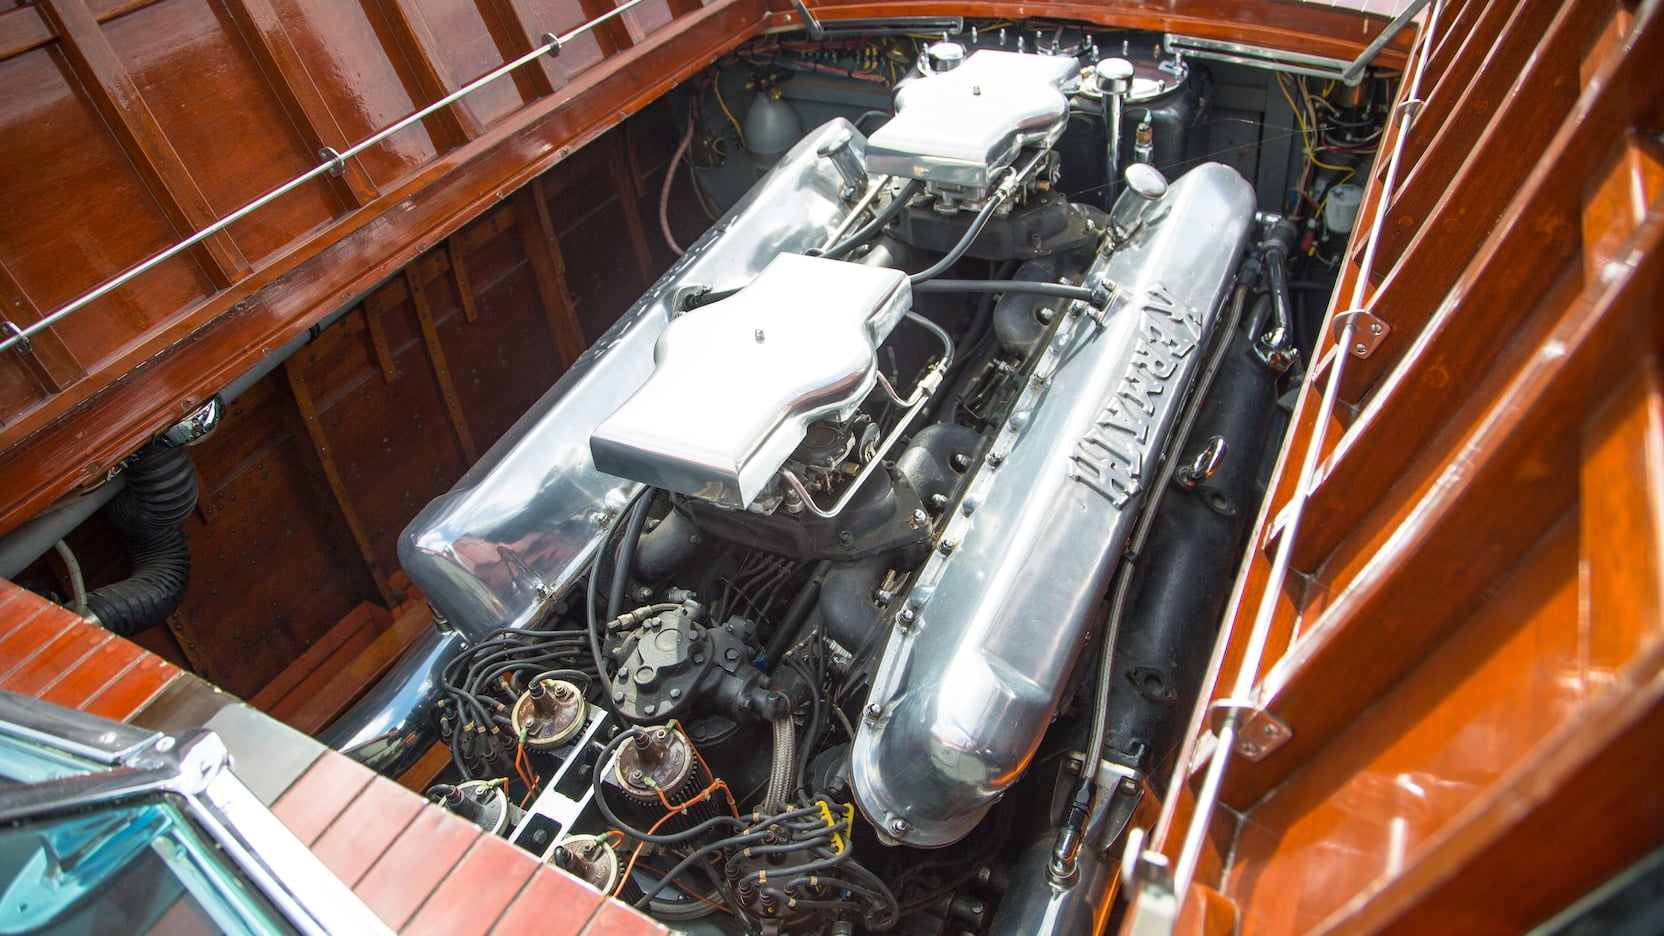 Kermath Sea Raider engine The 1,560 cubic inch V12 48 valves 24 spark plugs twin four barrel carburettors